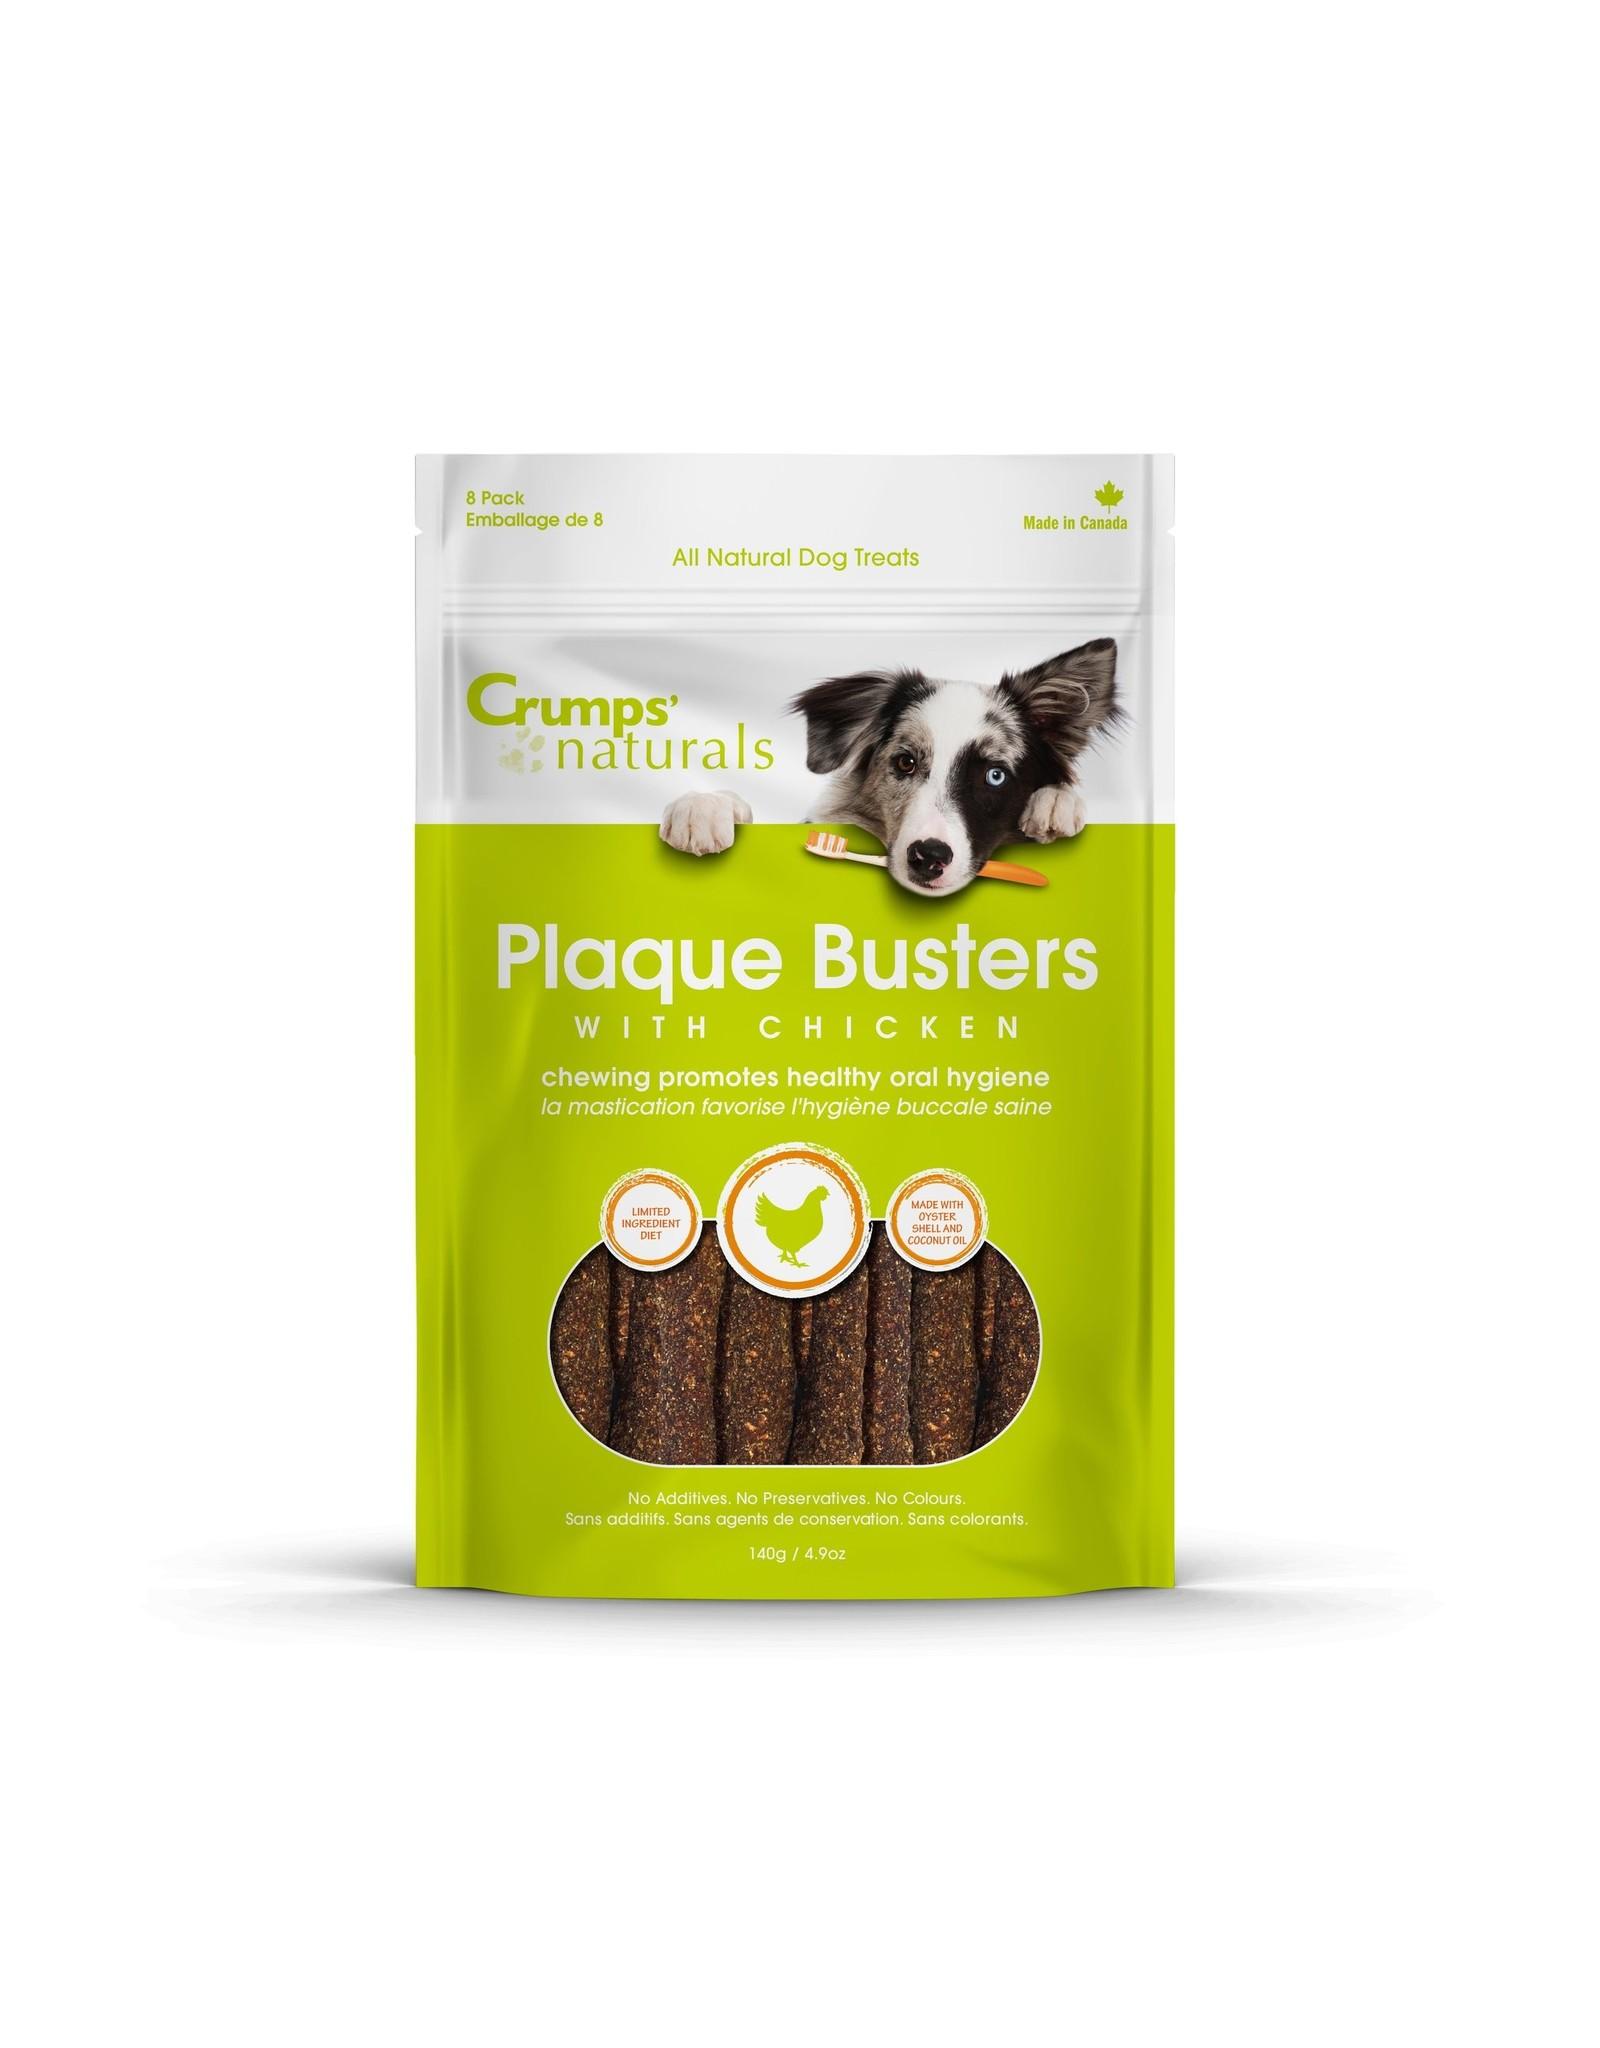 Crumps Naturals Crumps' Naturals Plaque Busters Chicken 7in 4.9oz Limited Ingredient Dog Dental Chews